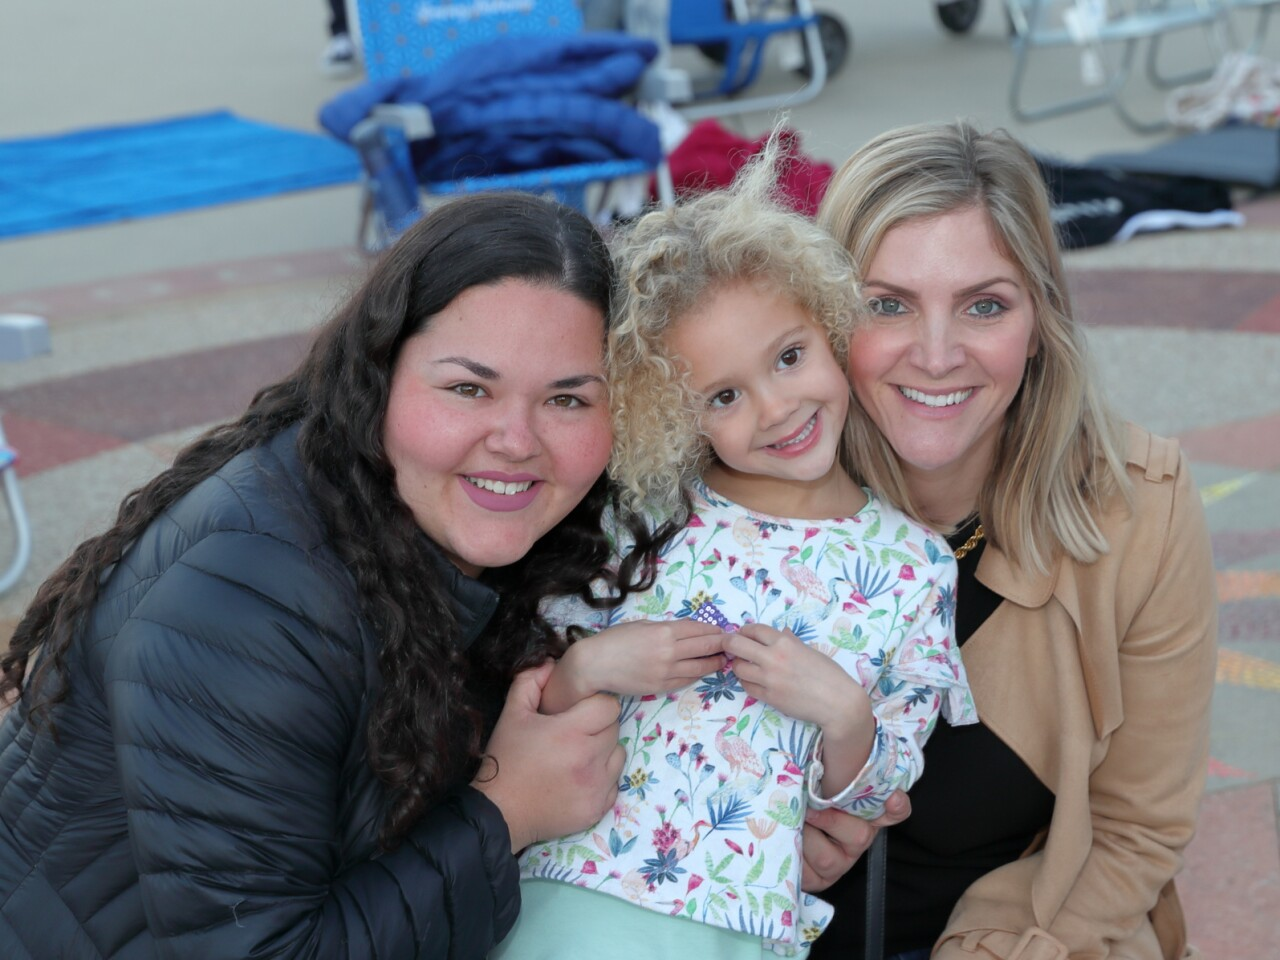 Regina, Vivian, and Lindsay Mateo